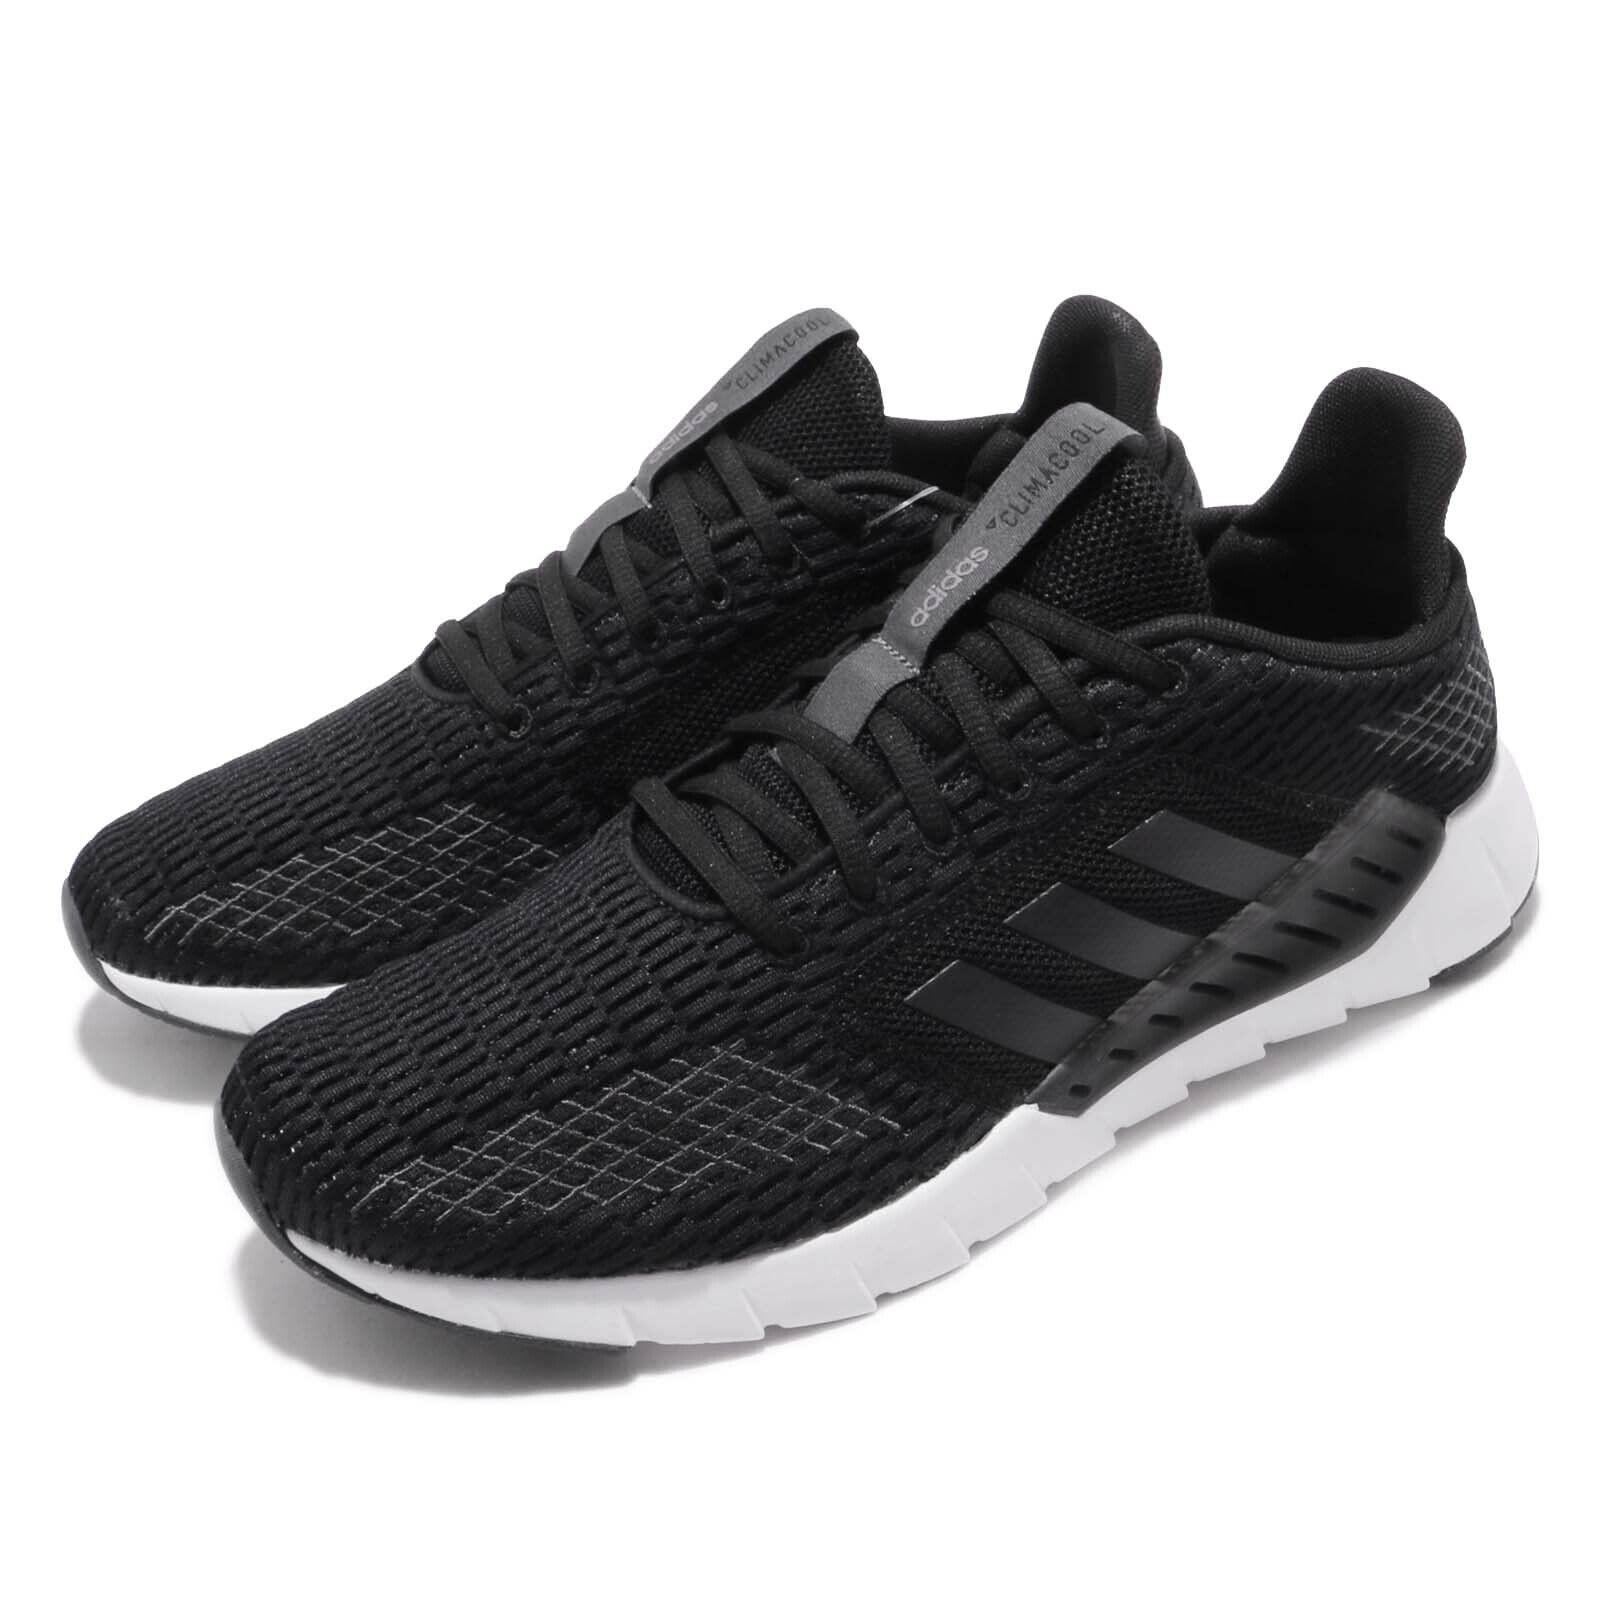 Adidas Asweego CC Negro gris blancooo Hombres Zapatos Tenis Tenis Tenis Informales Correr F36324 7f733d